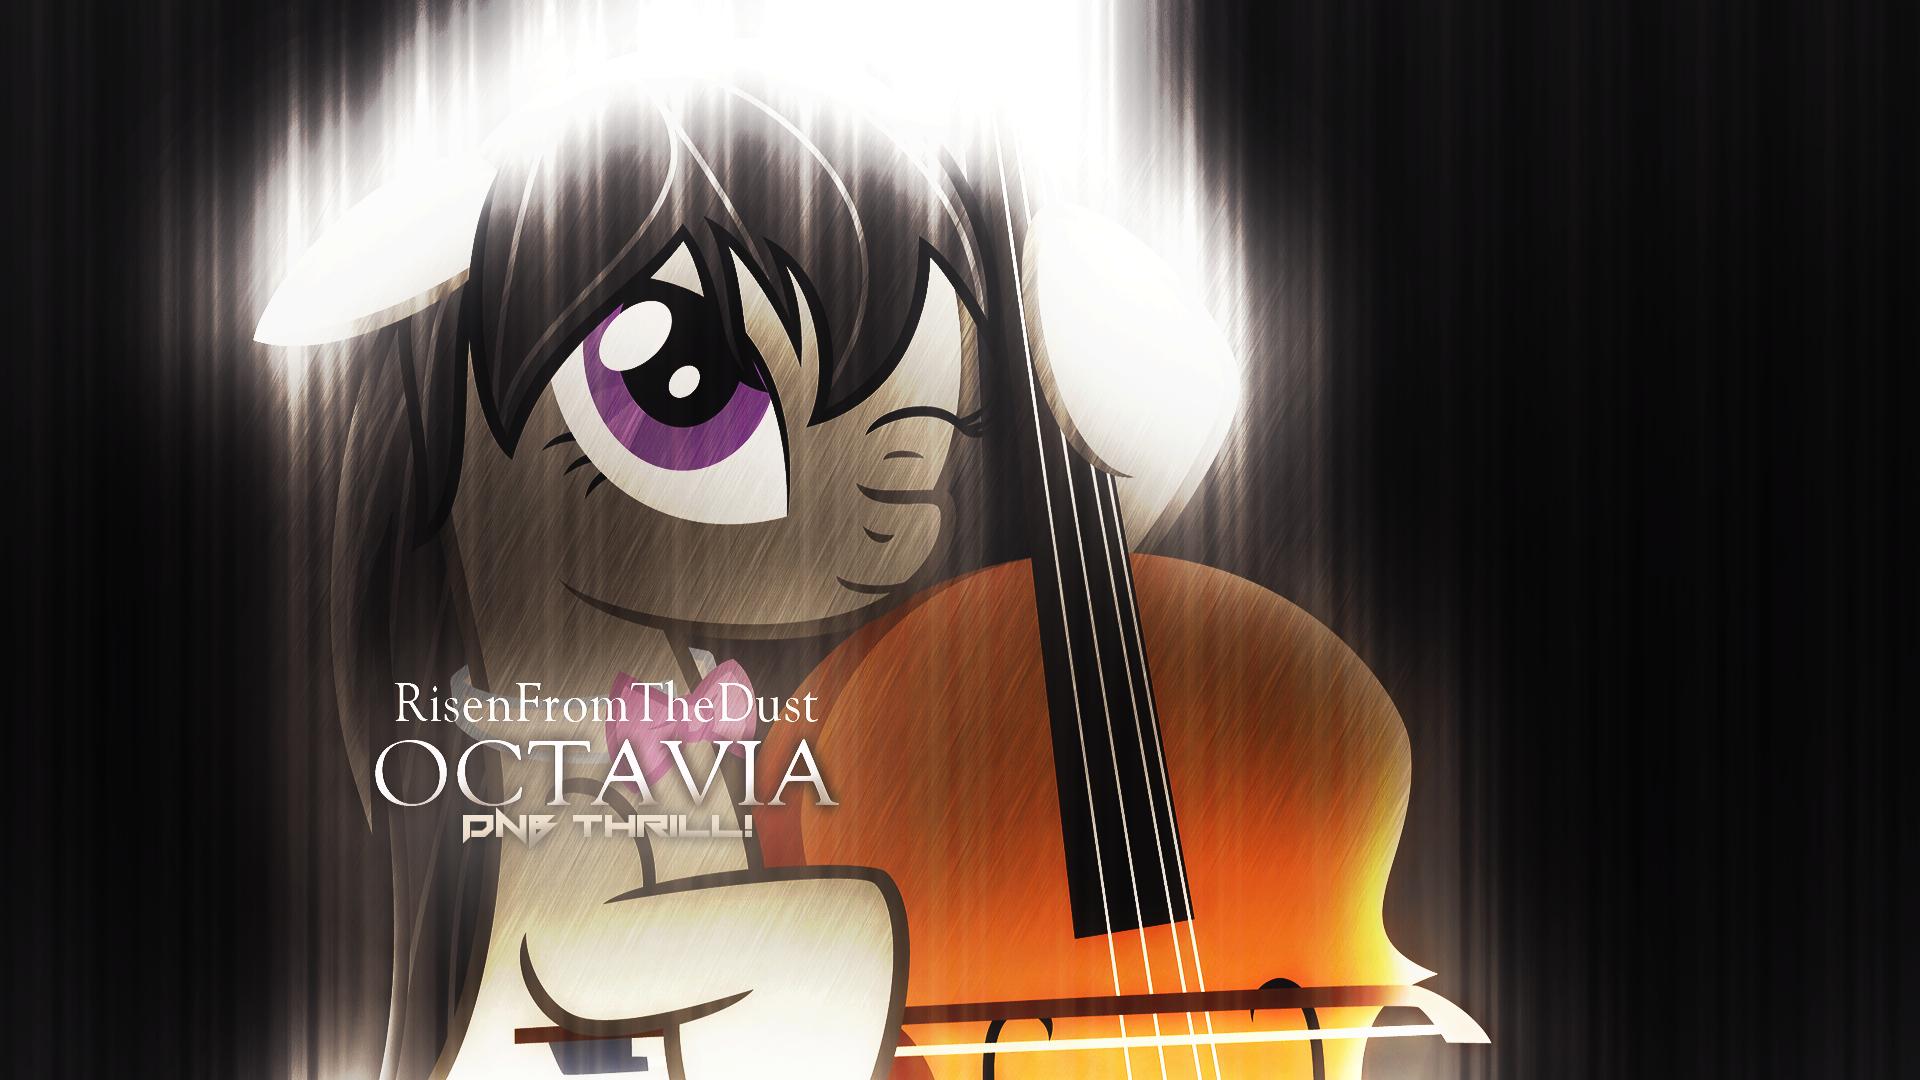 Octavia DnB Thrill! Cover Wallpaper (Alter2) by Nianara and Xtrl